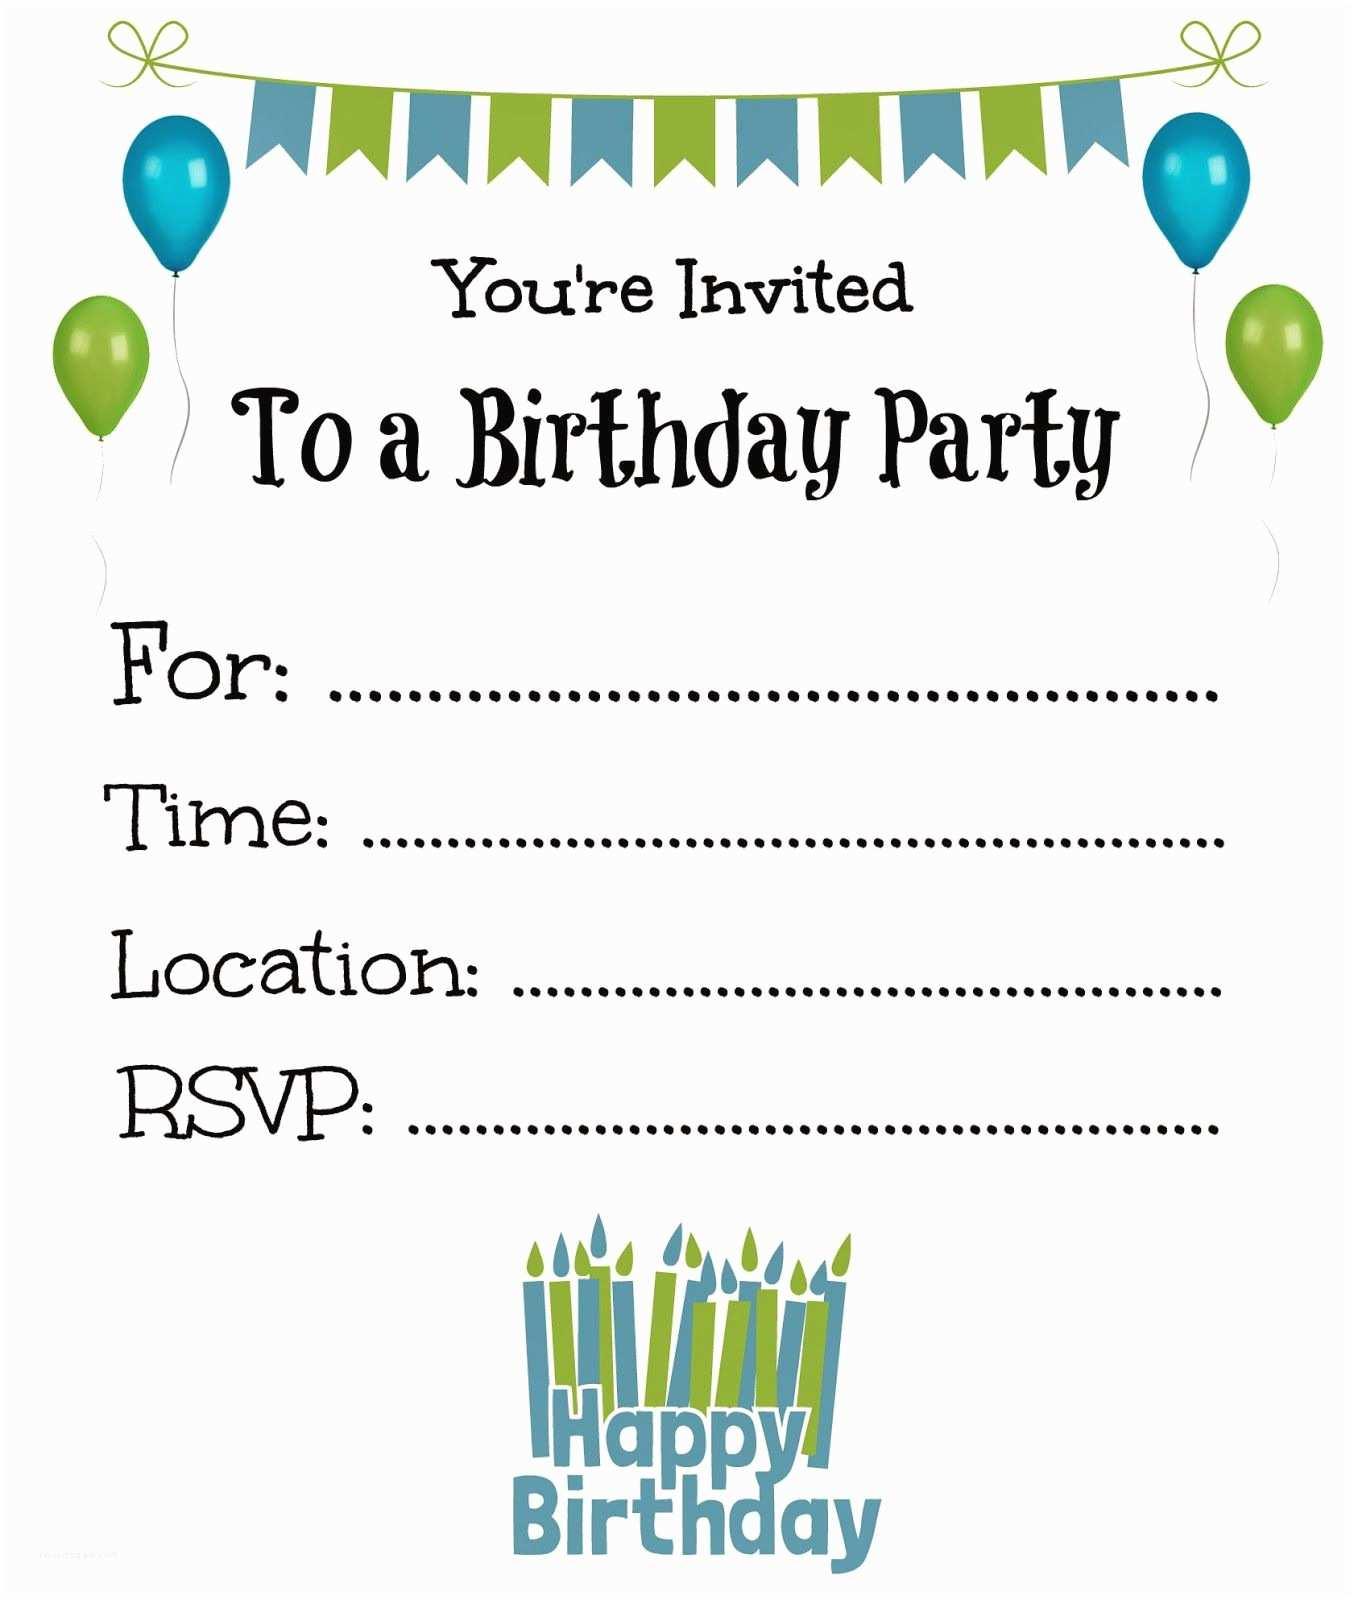 Boy Birthday Invitations 21 Kids Birthday Invitation Wording that We Can Make